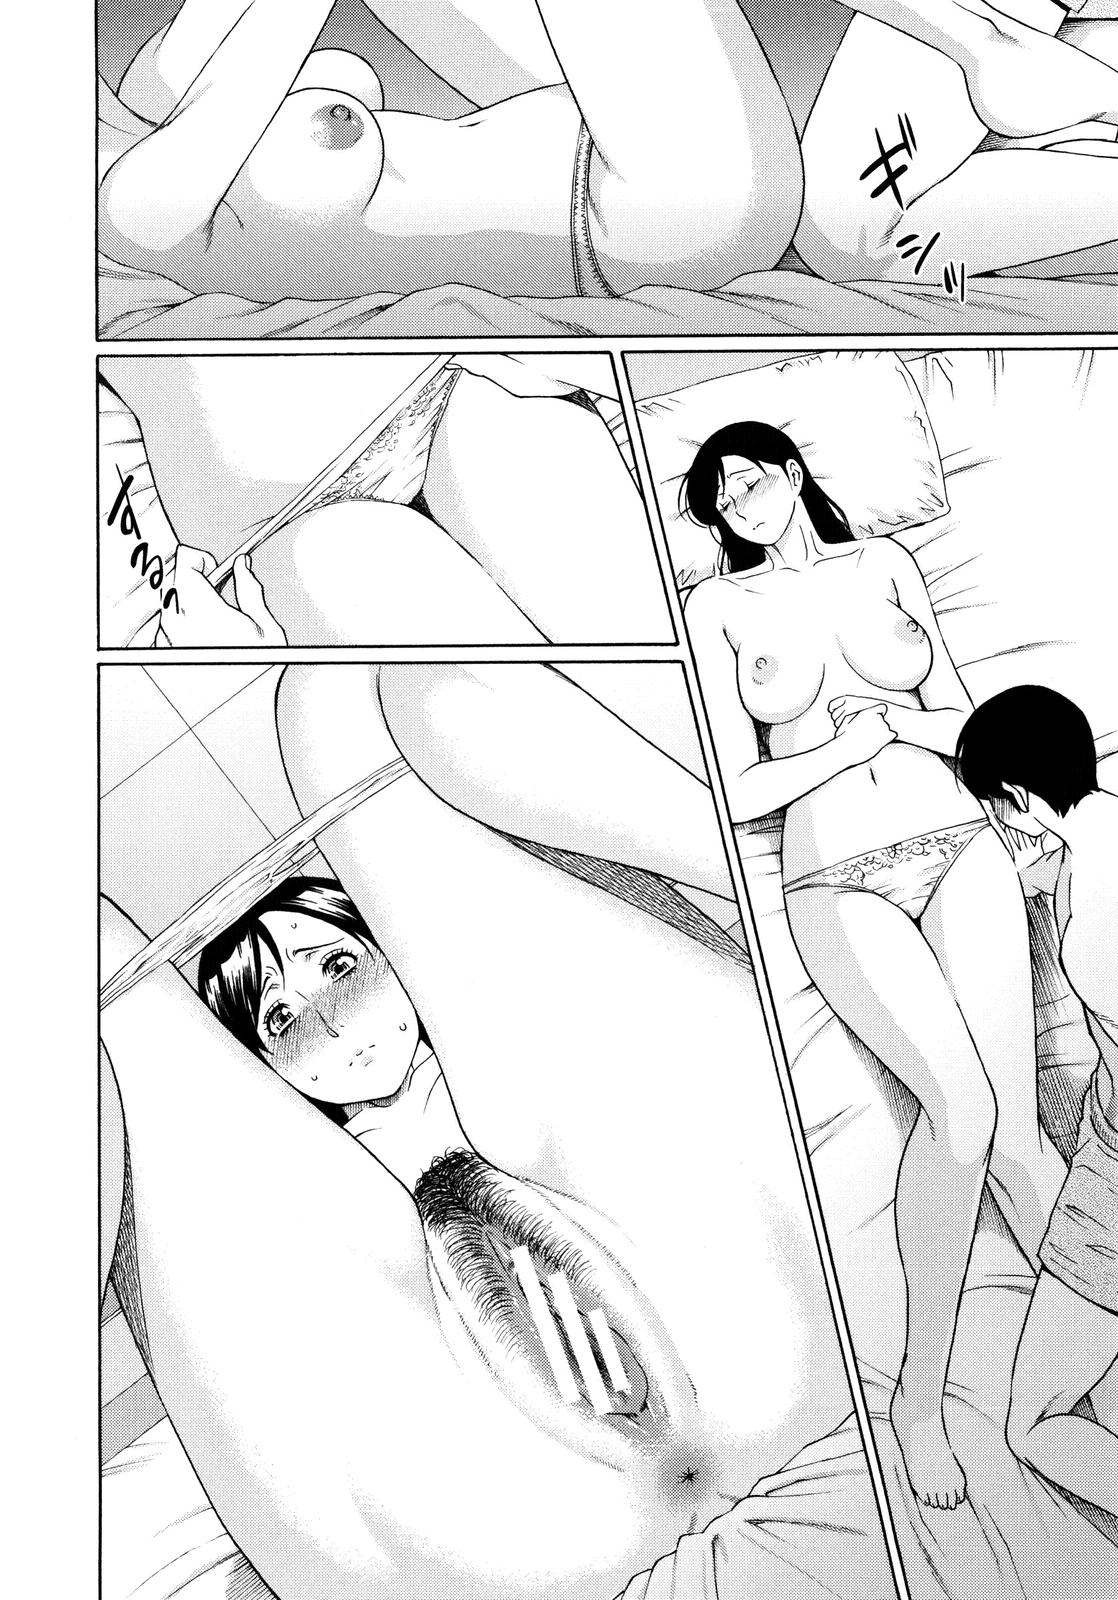 Порно Комикс Хентай Инцест Манга